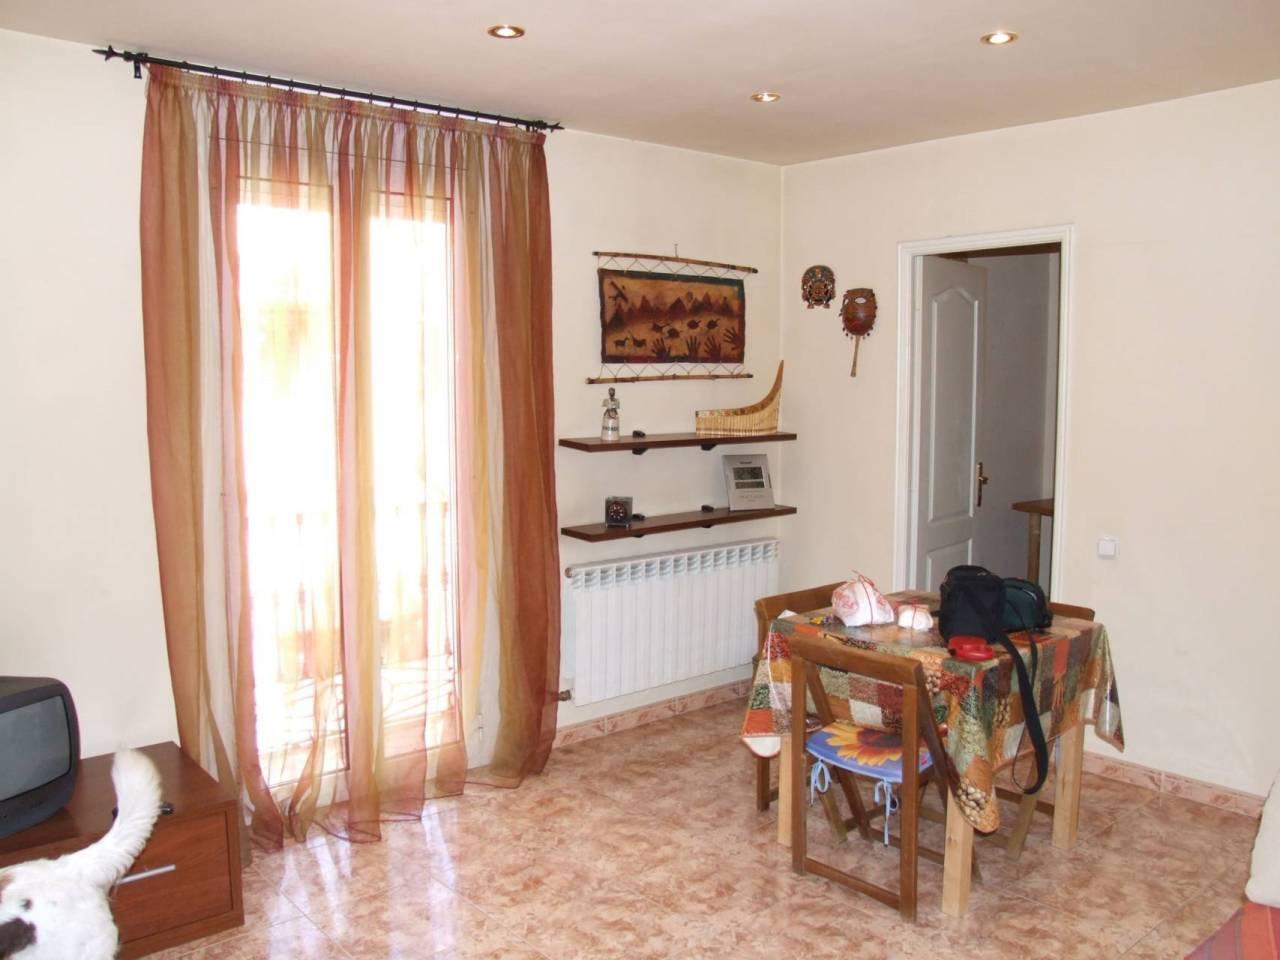 Piso  Calle canonge muntanya. Superf. 65 m²,  2 habitaciones (1 doble,  1 individual),  1 baño